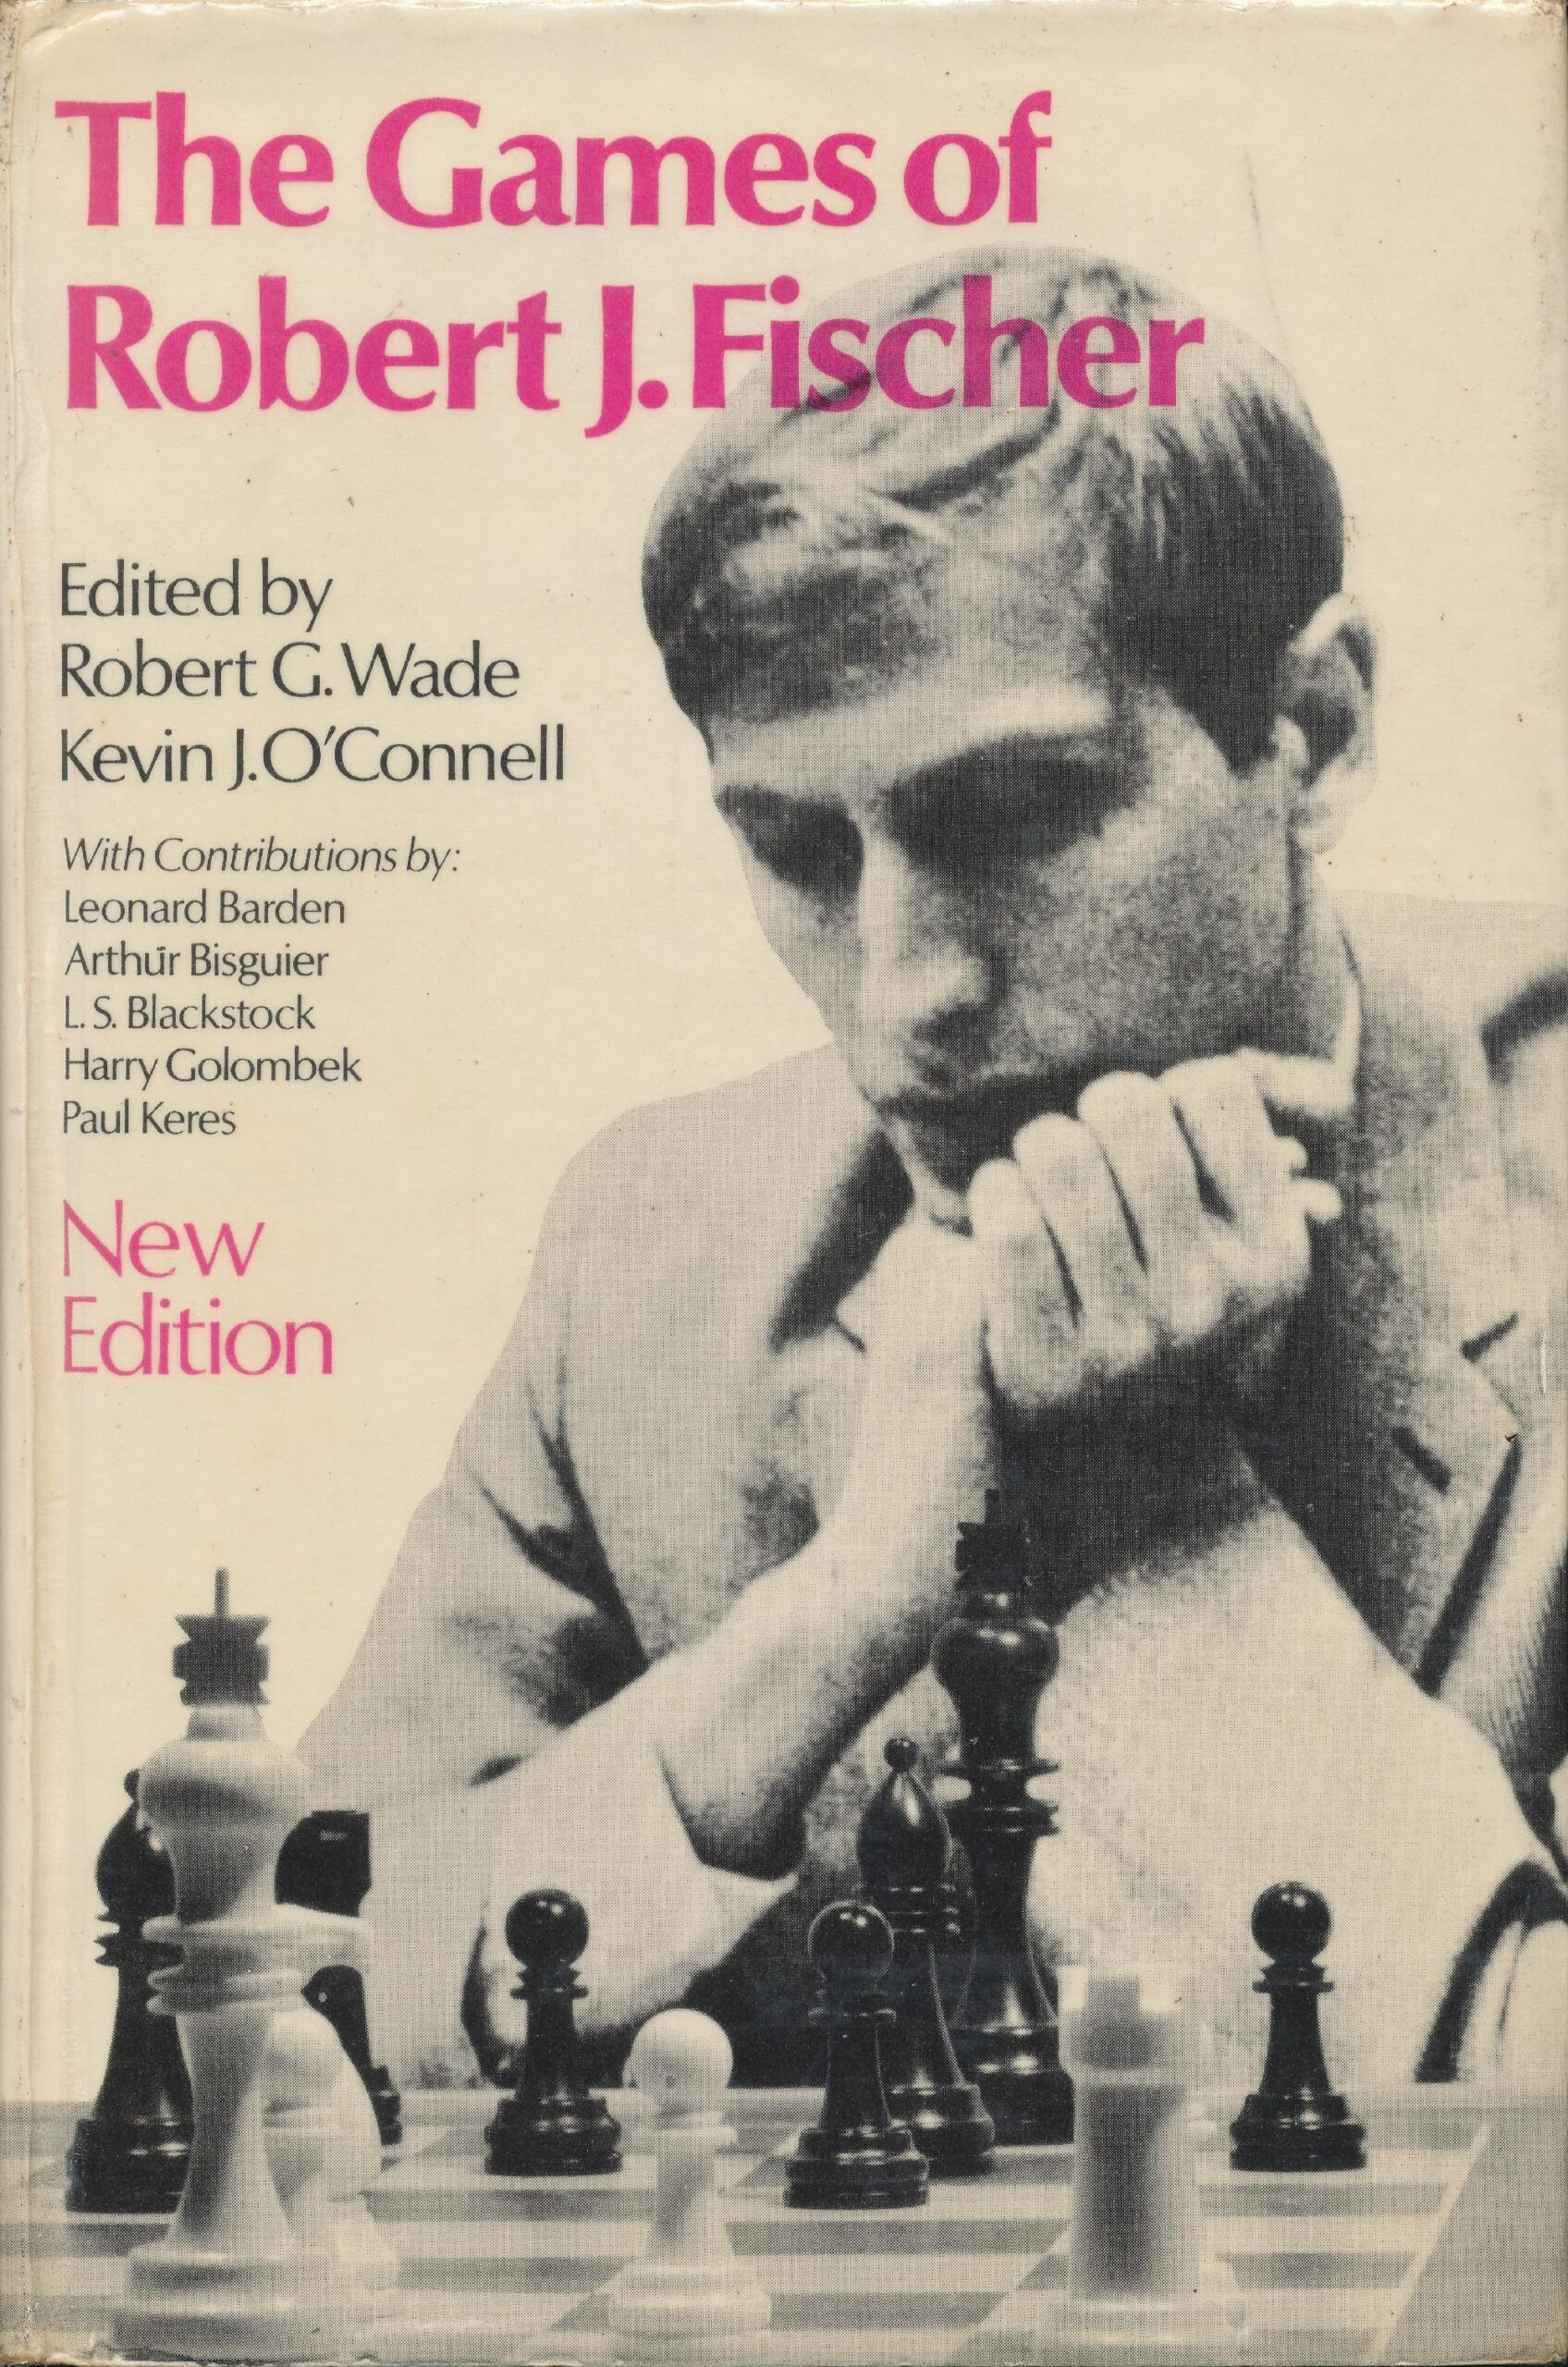 The Games of Robert J. Fischer, Robert Wade and O'Connell, Batsford 1972, 2nd ed. 1972, reprinted 1973, First limp edition 1981, Reprinted 1985, 1981, 1989, Second edition (The Complete Games of Bobby Fischer) 1992